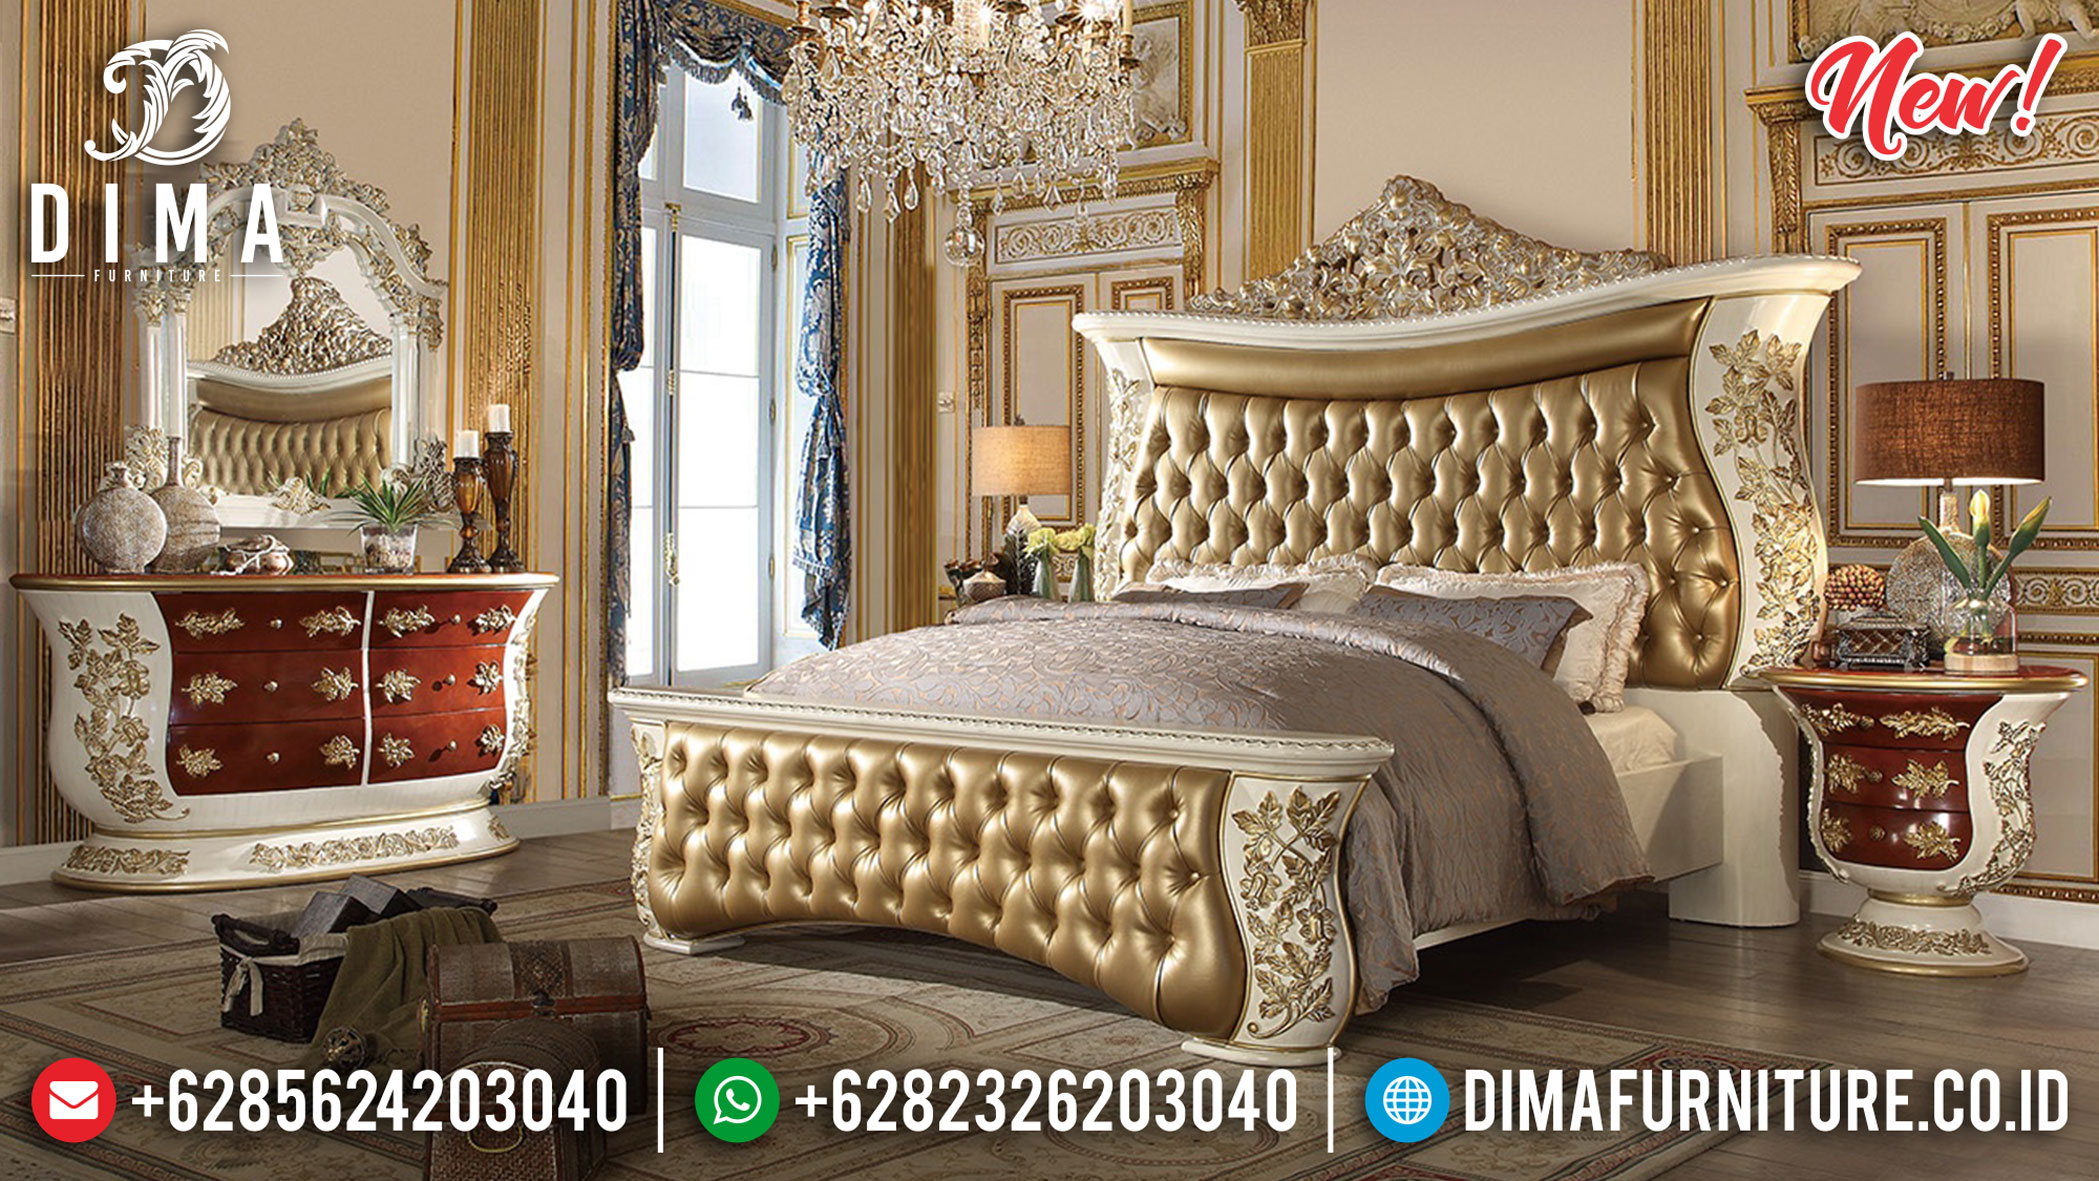 Black Friday Sale Tempat Tidur Mewah Ukiran Luxury Carving Europe Kingdom Style TTJ-1170